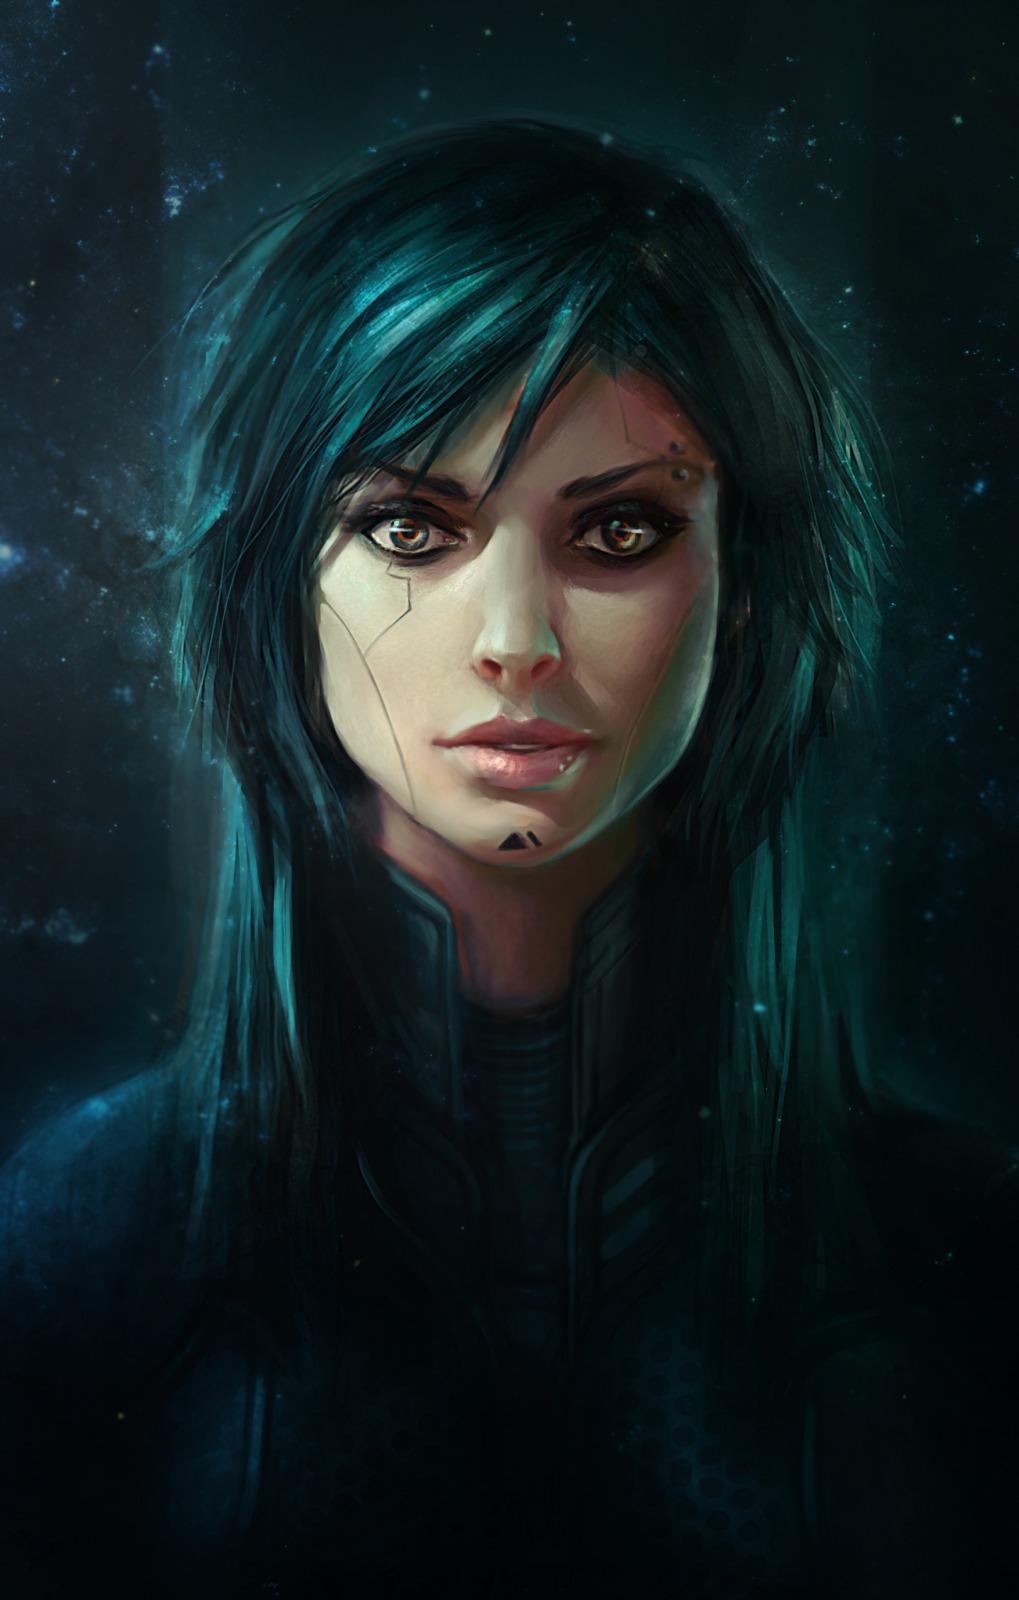 File 1019x1600 7445 Kaa 2d Sci Fi Portrait Female Girl